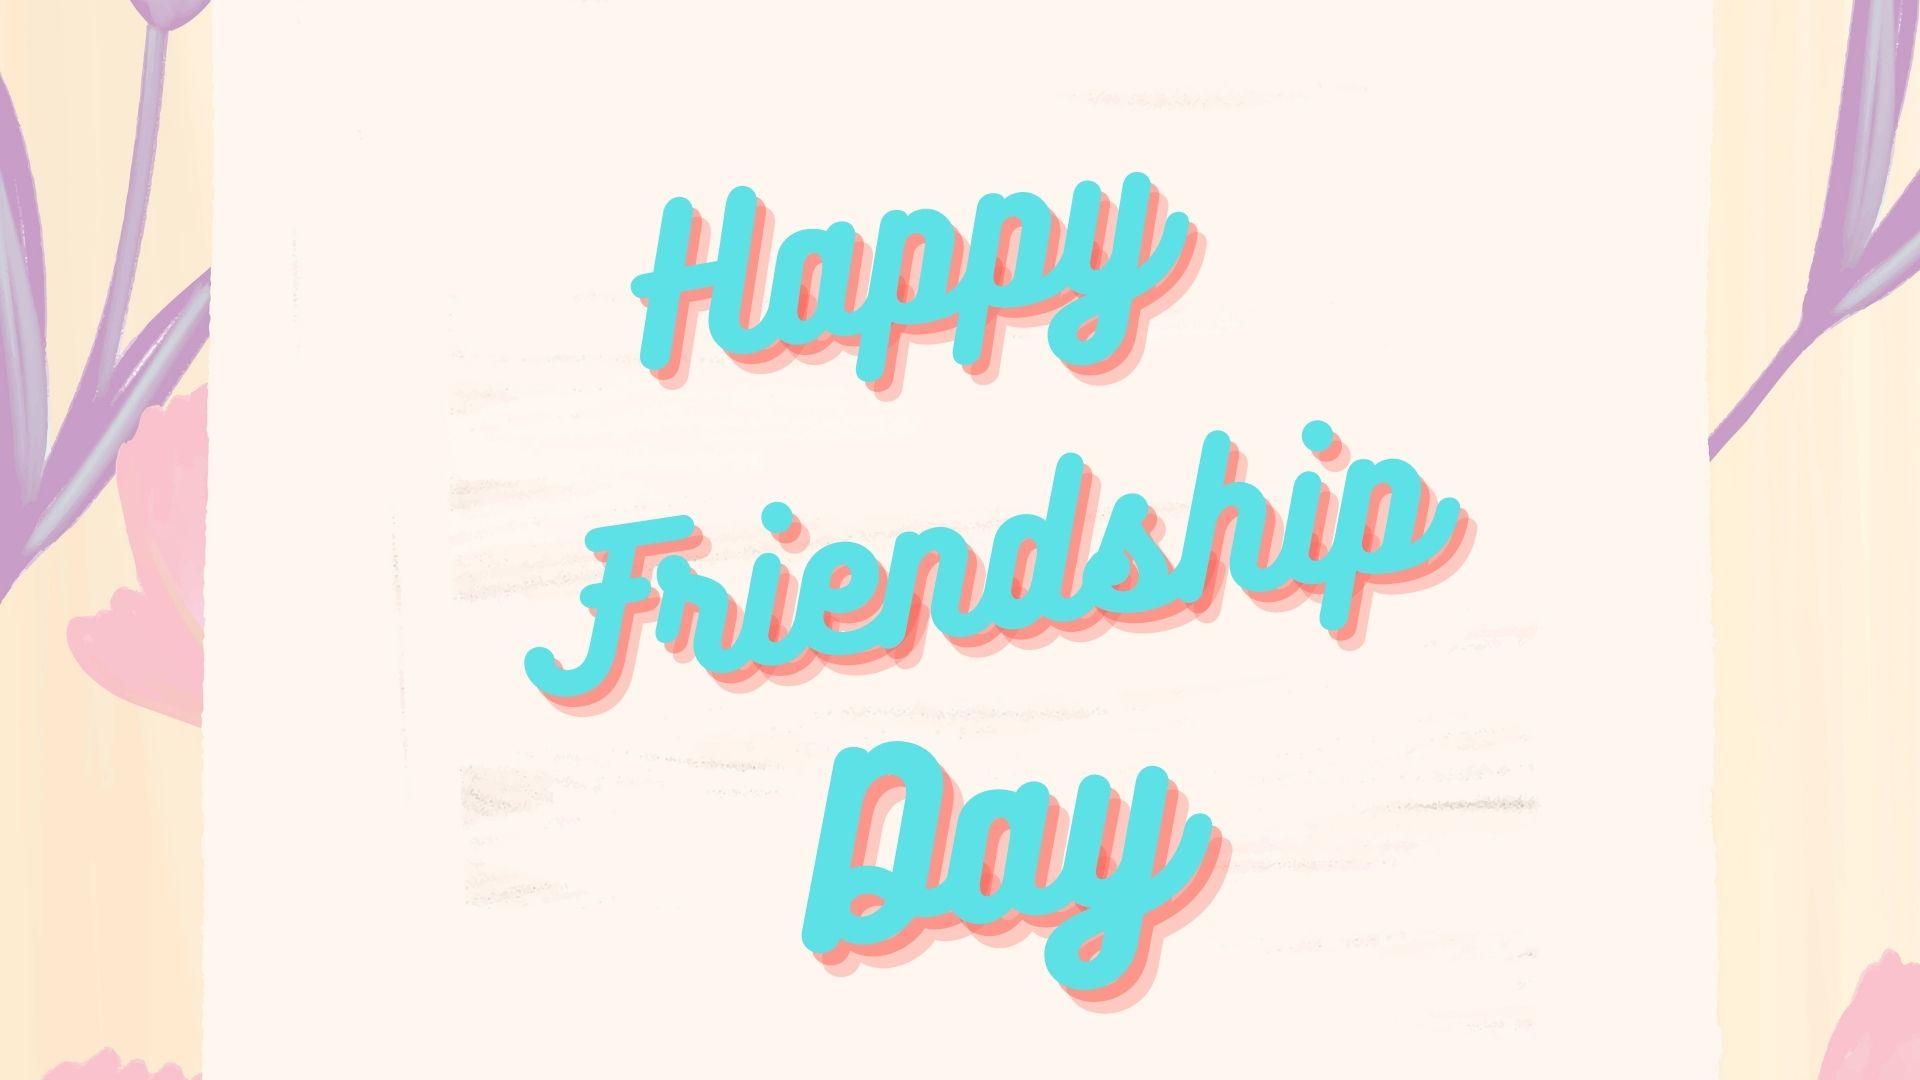 Happy Friendship Day